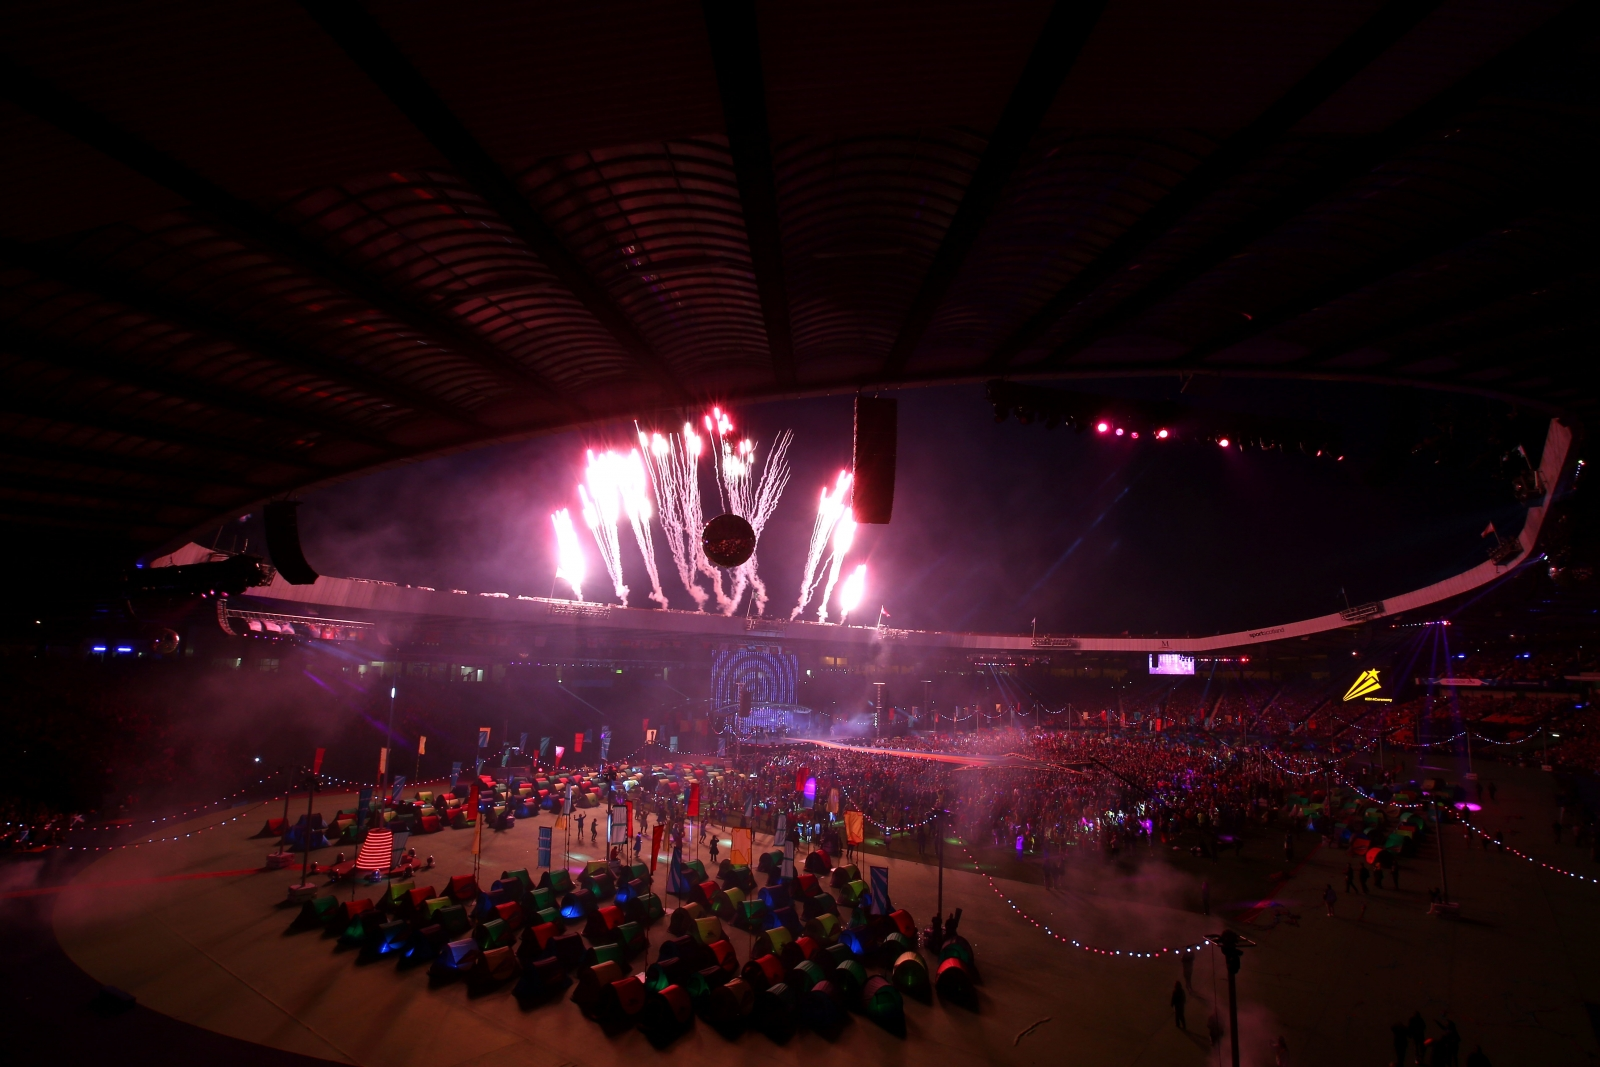 Glasgow 2014 Commonwealth Games closing ceremony